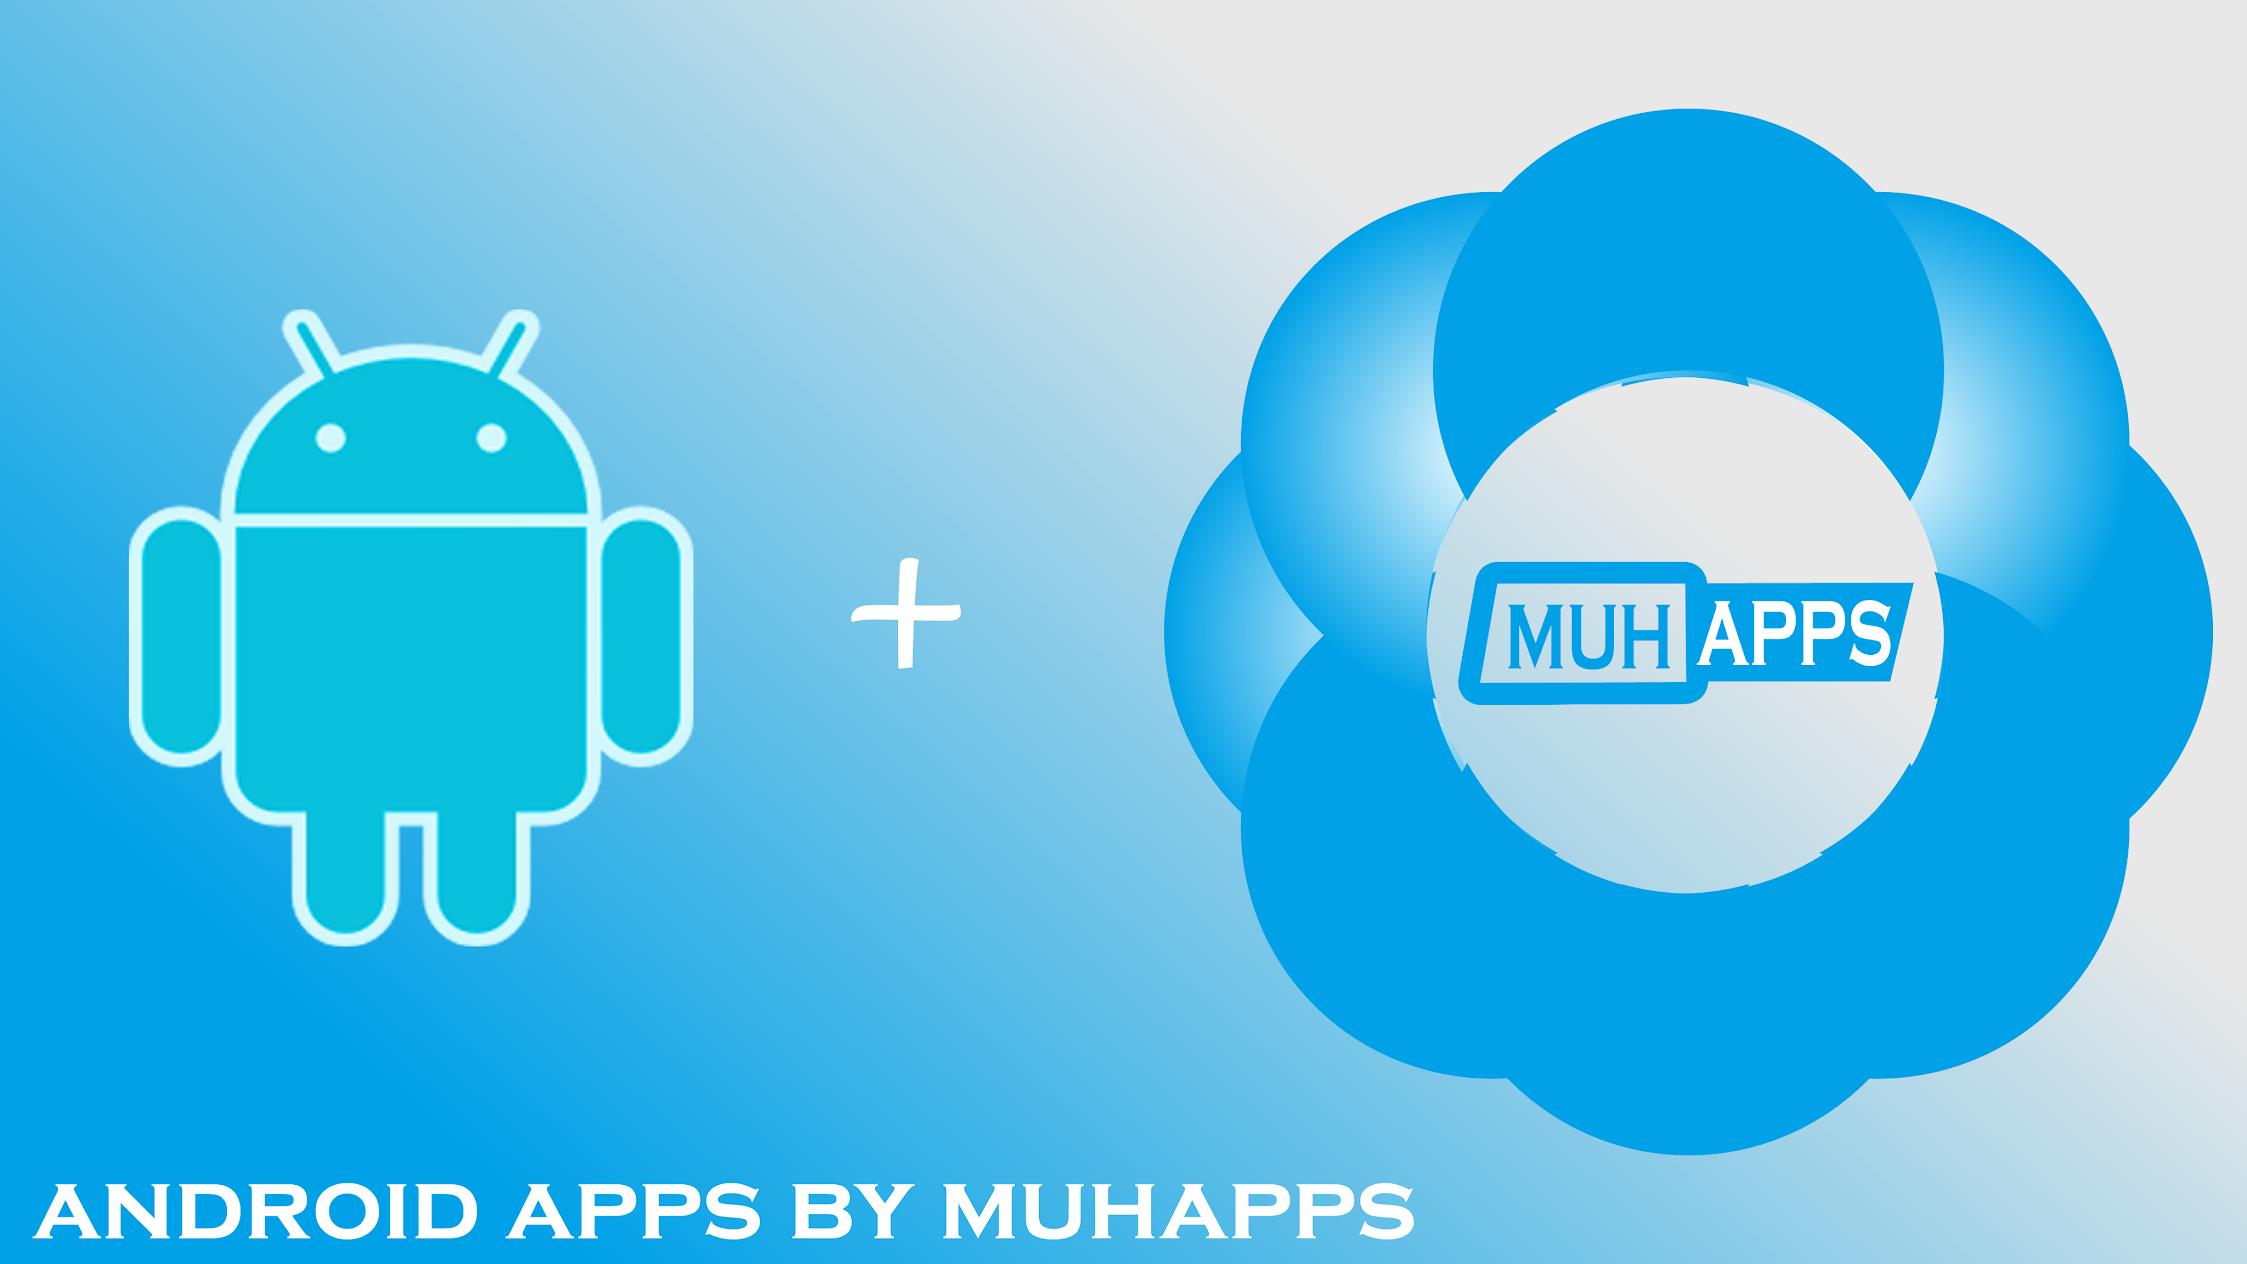 muhapps